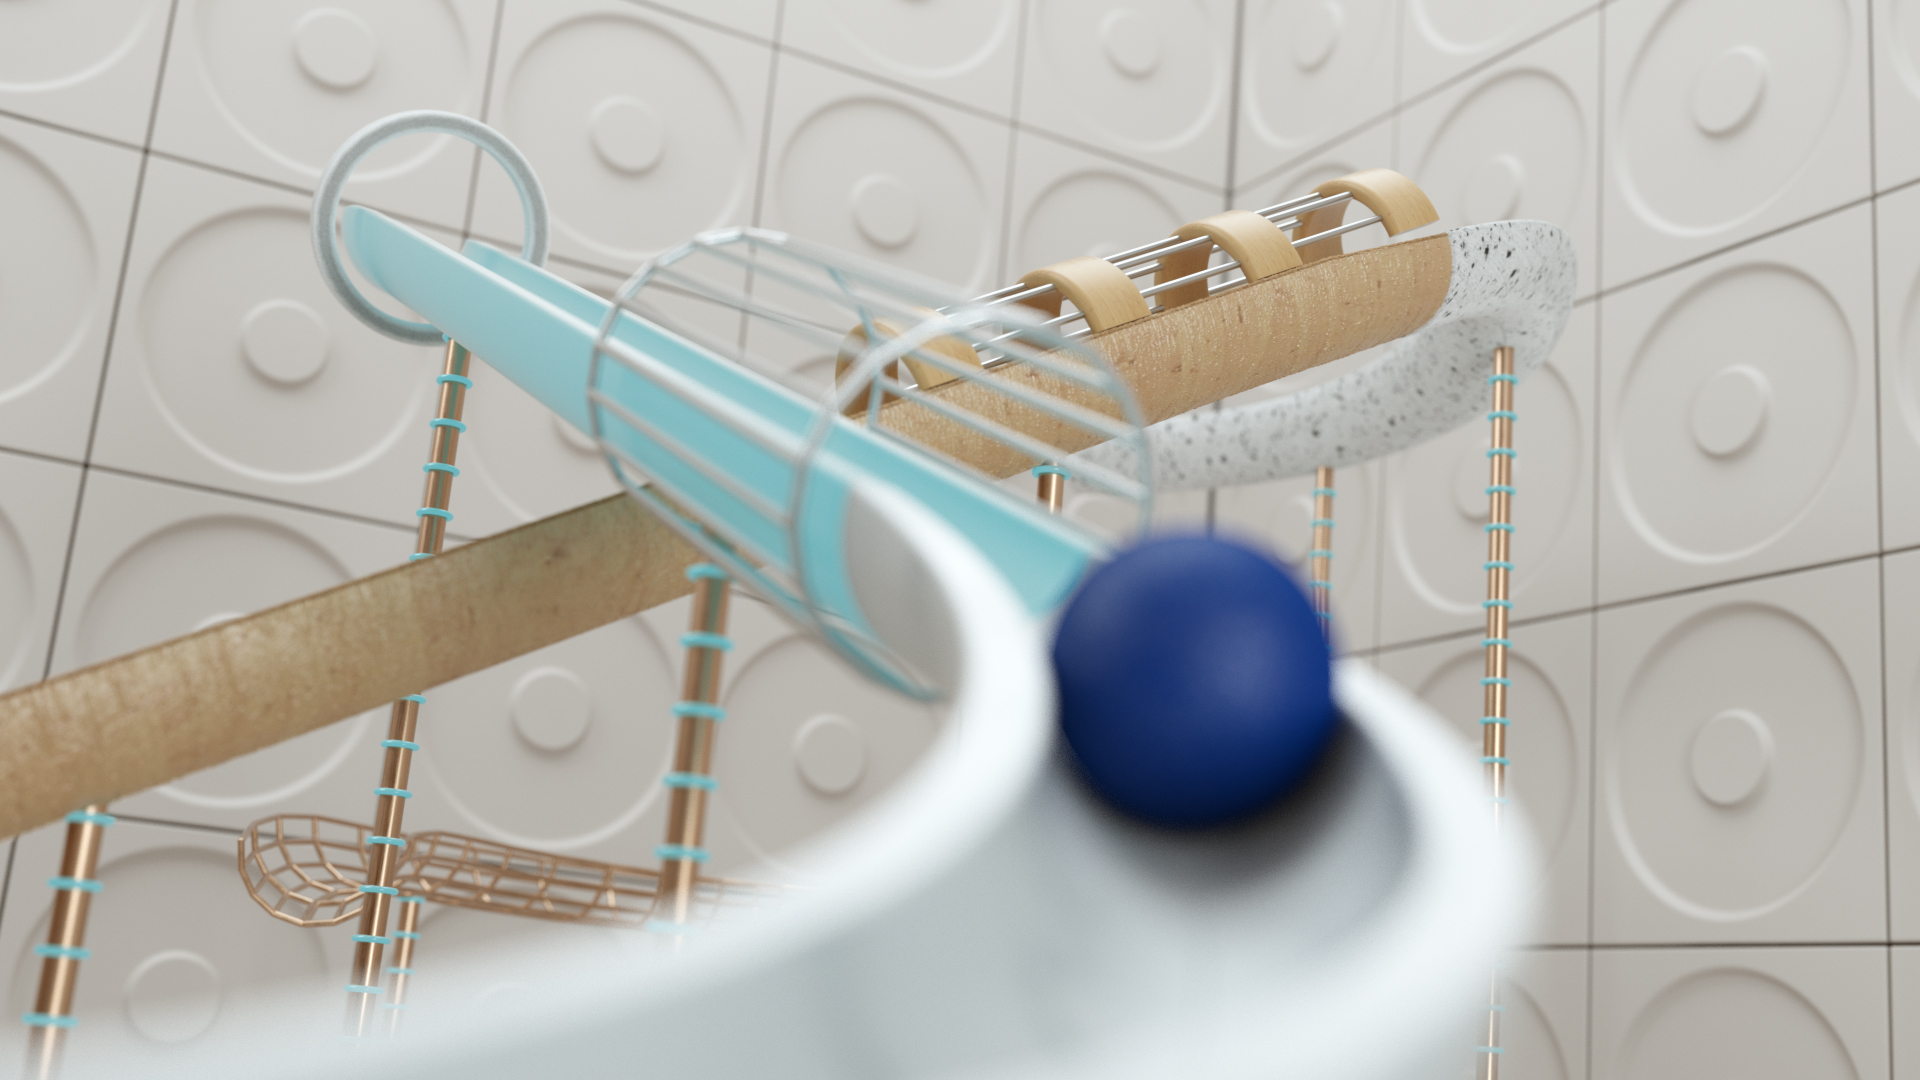 Rollercoaster_CloseUp_Styleframe02.jpg